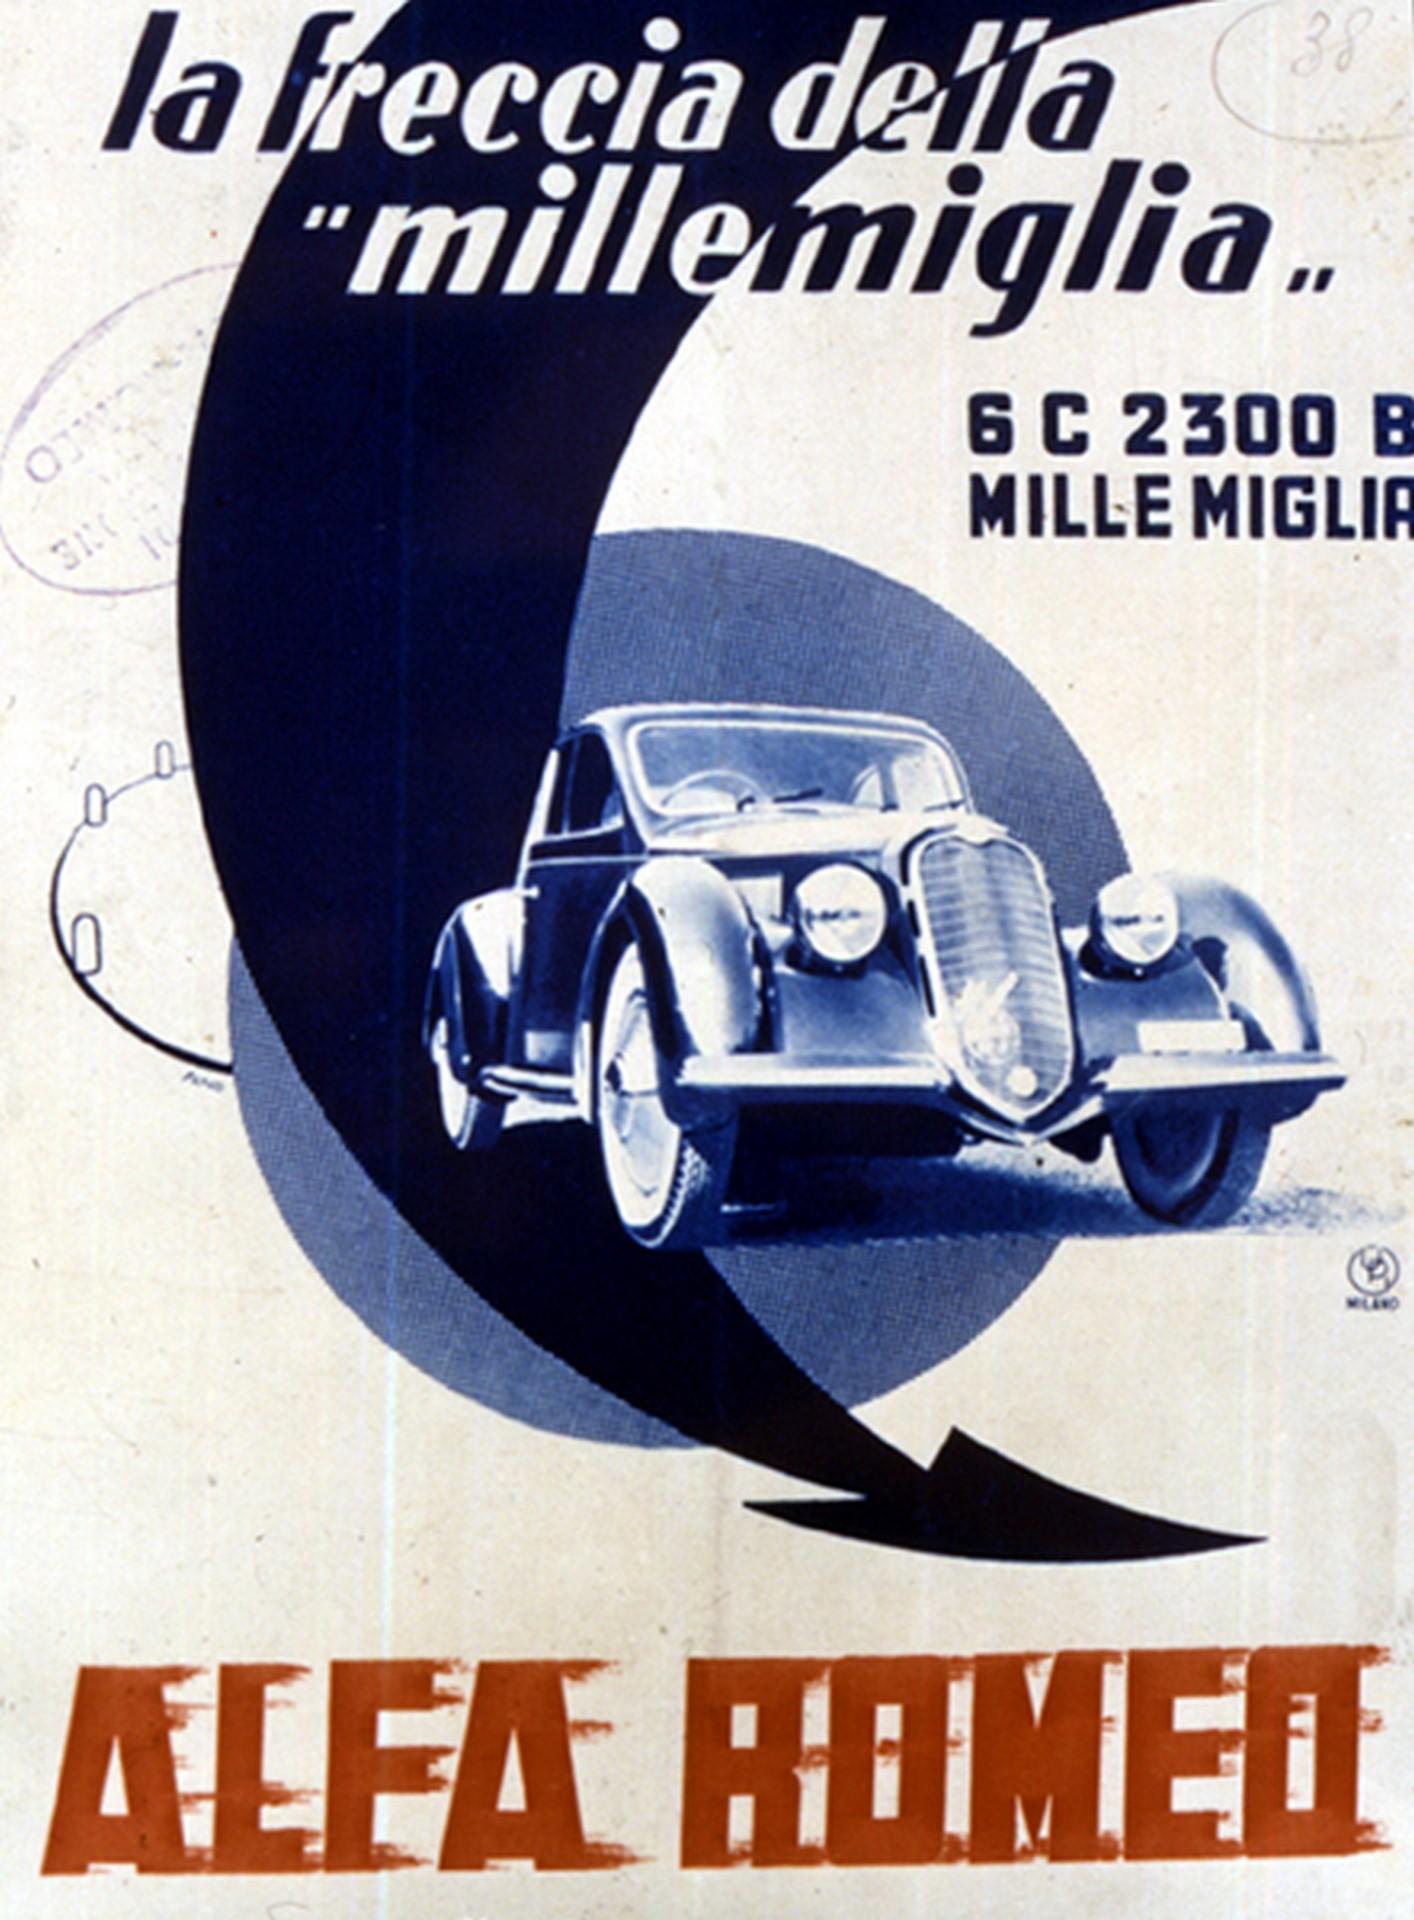 170512_Heritage_Mille-miglia_11